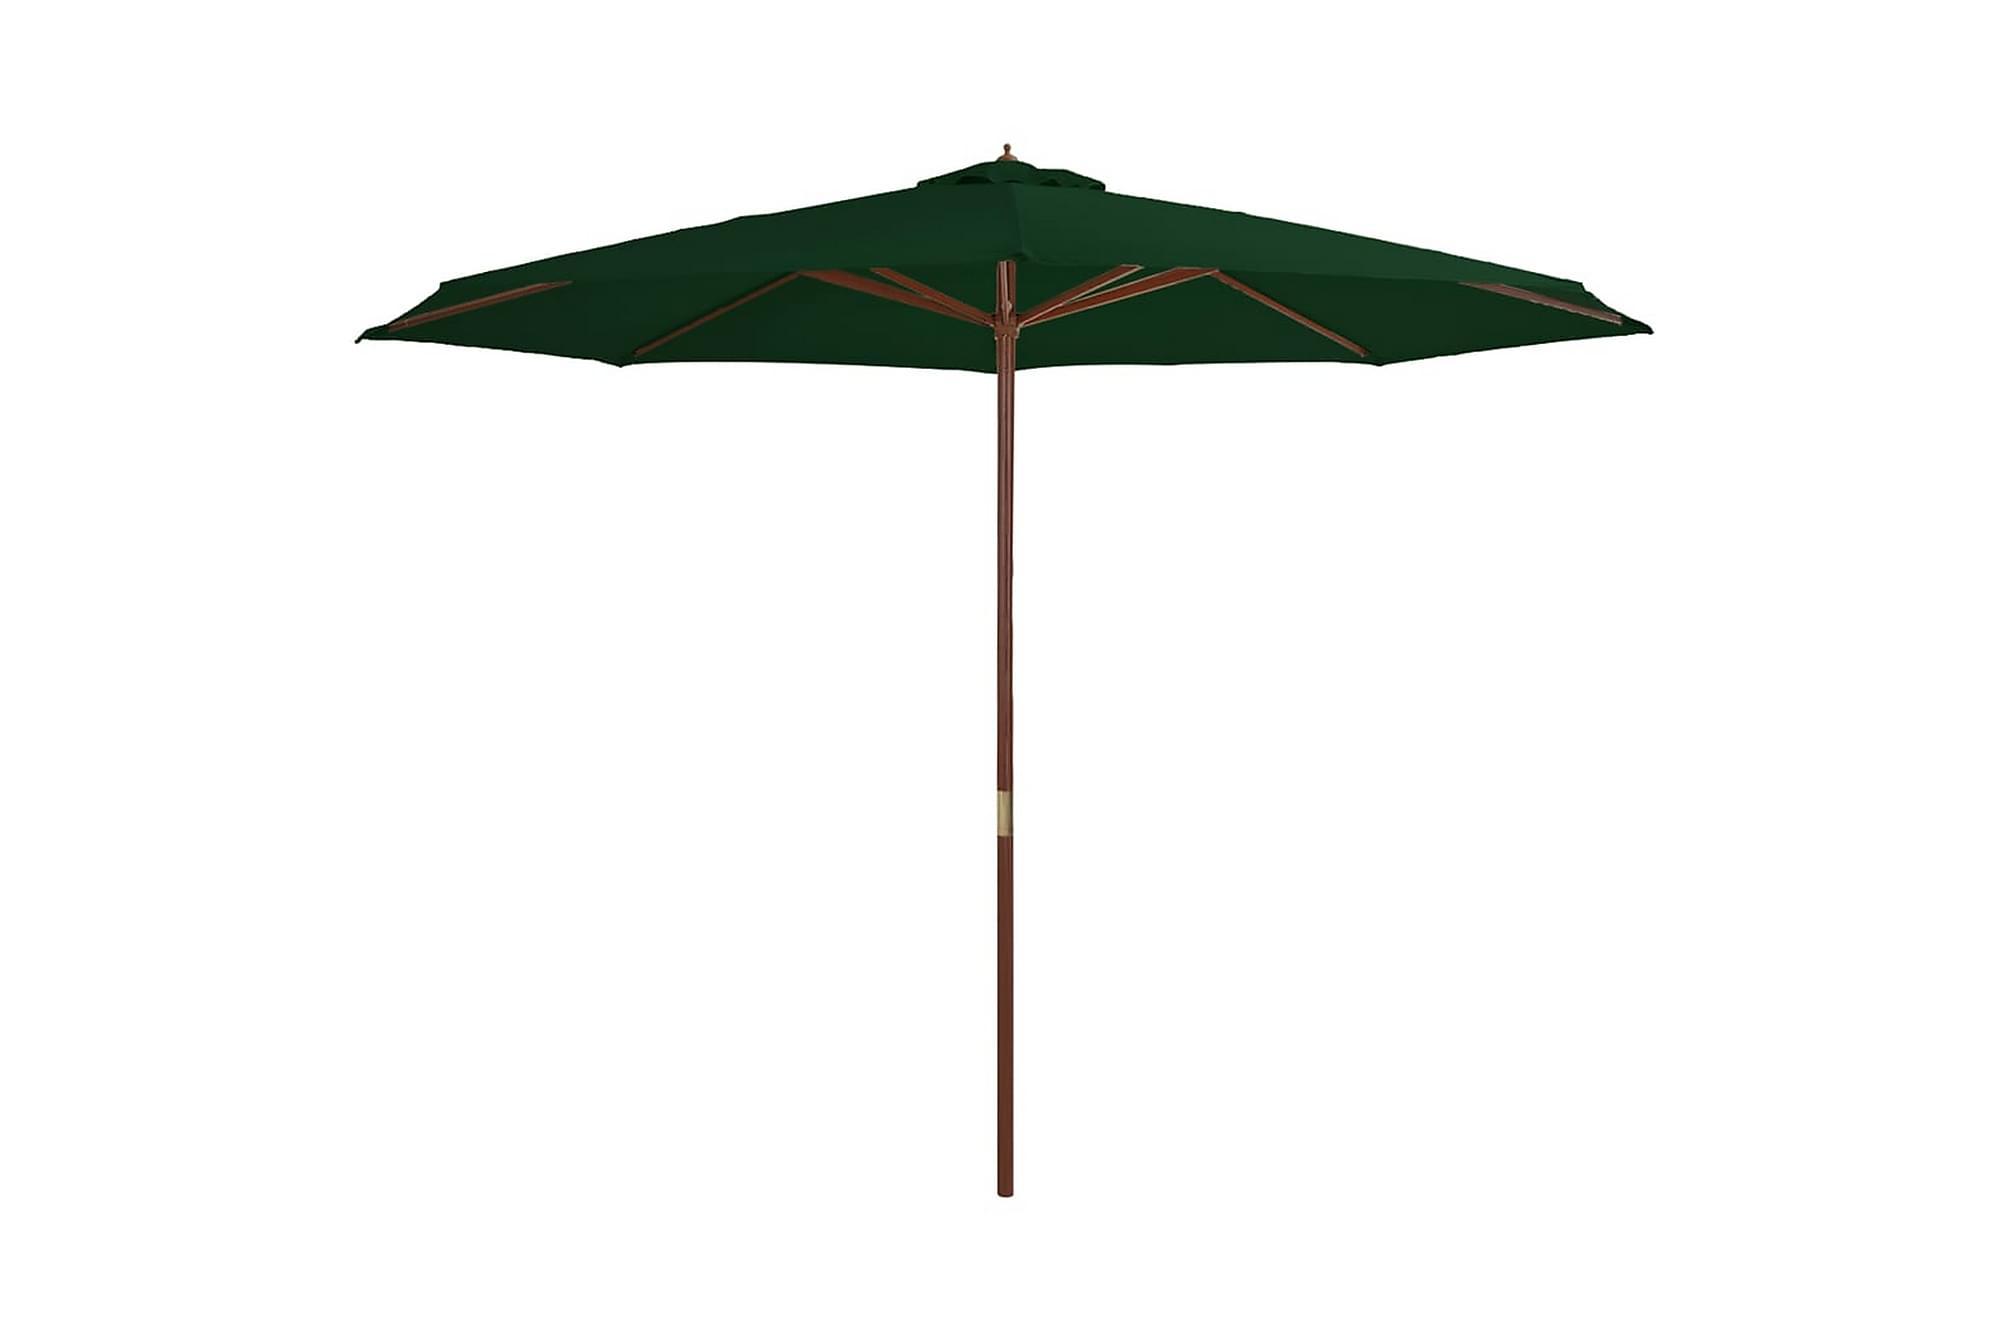 Trädgårdsparasoll m. trästång grönt 350 cm